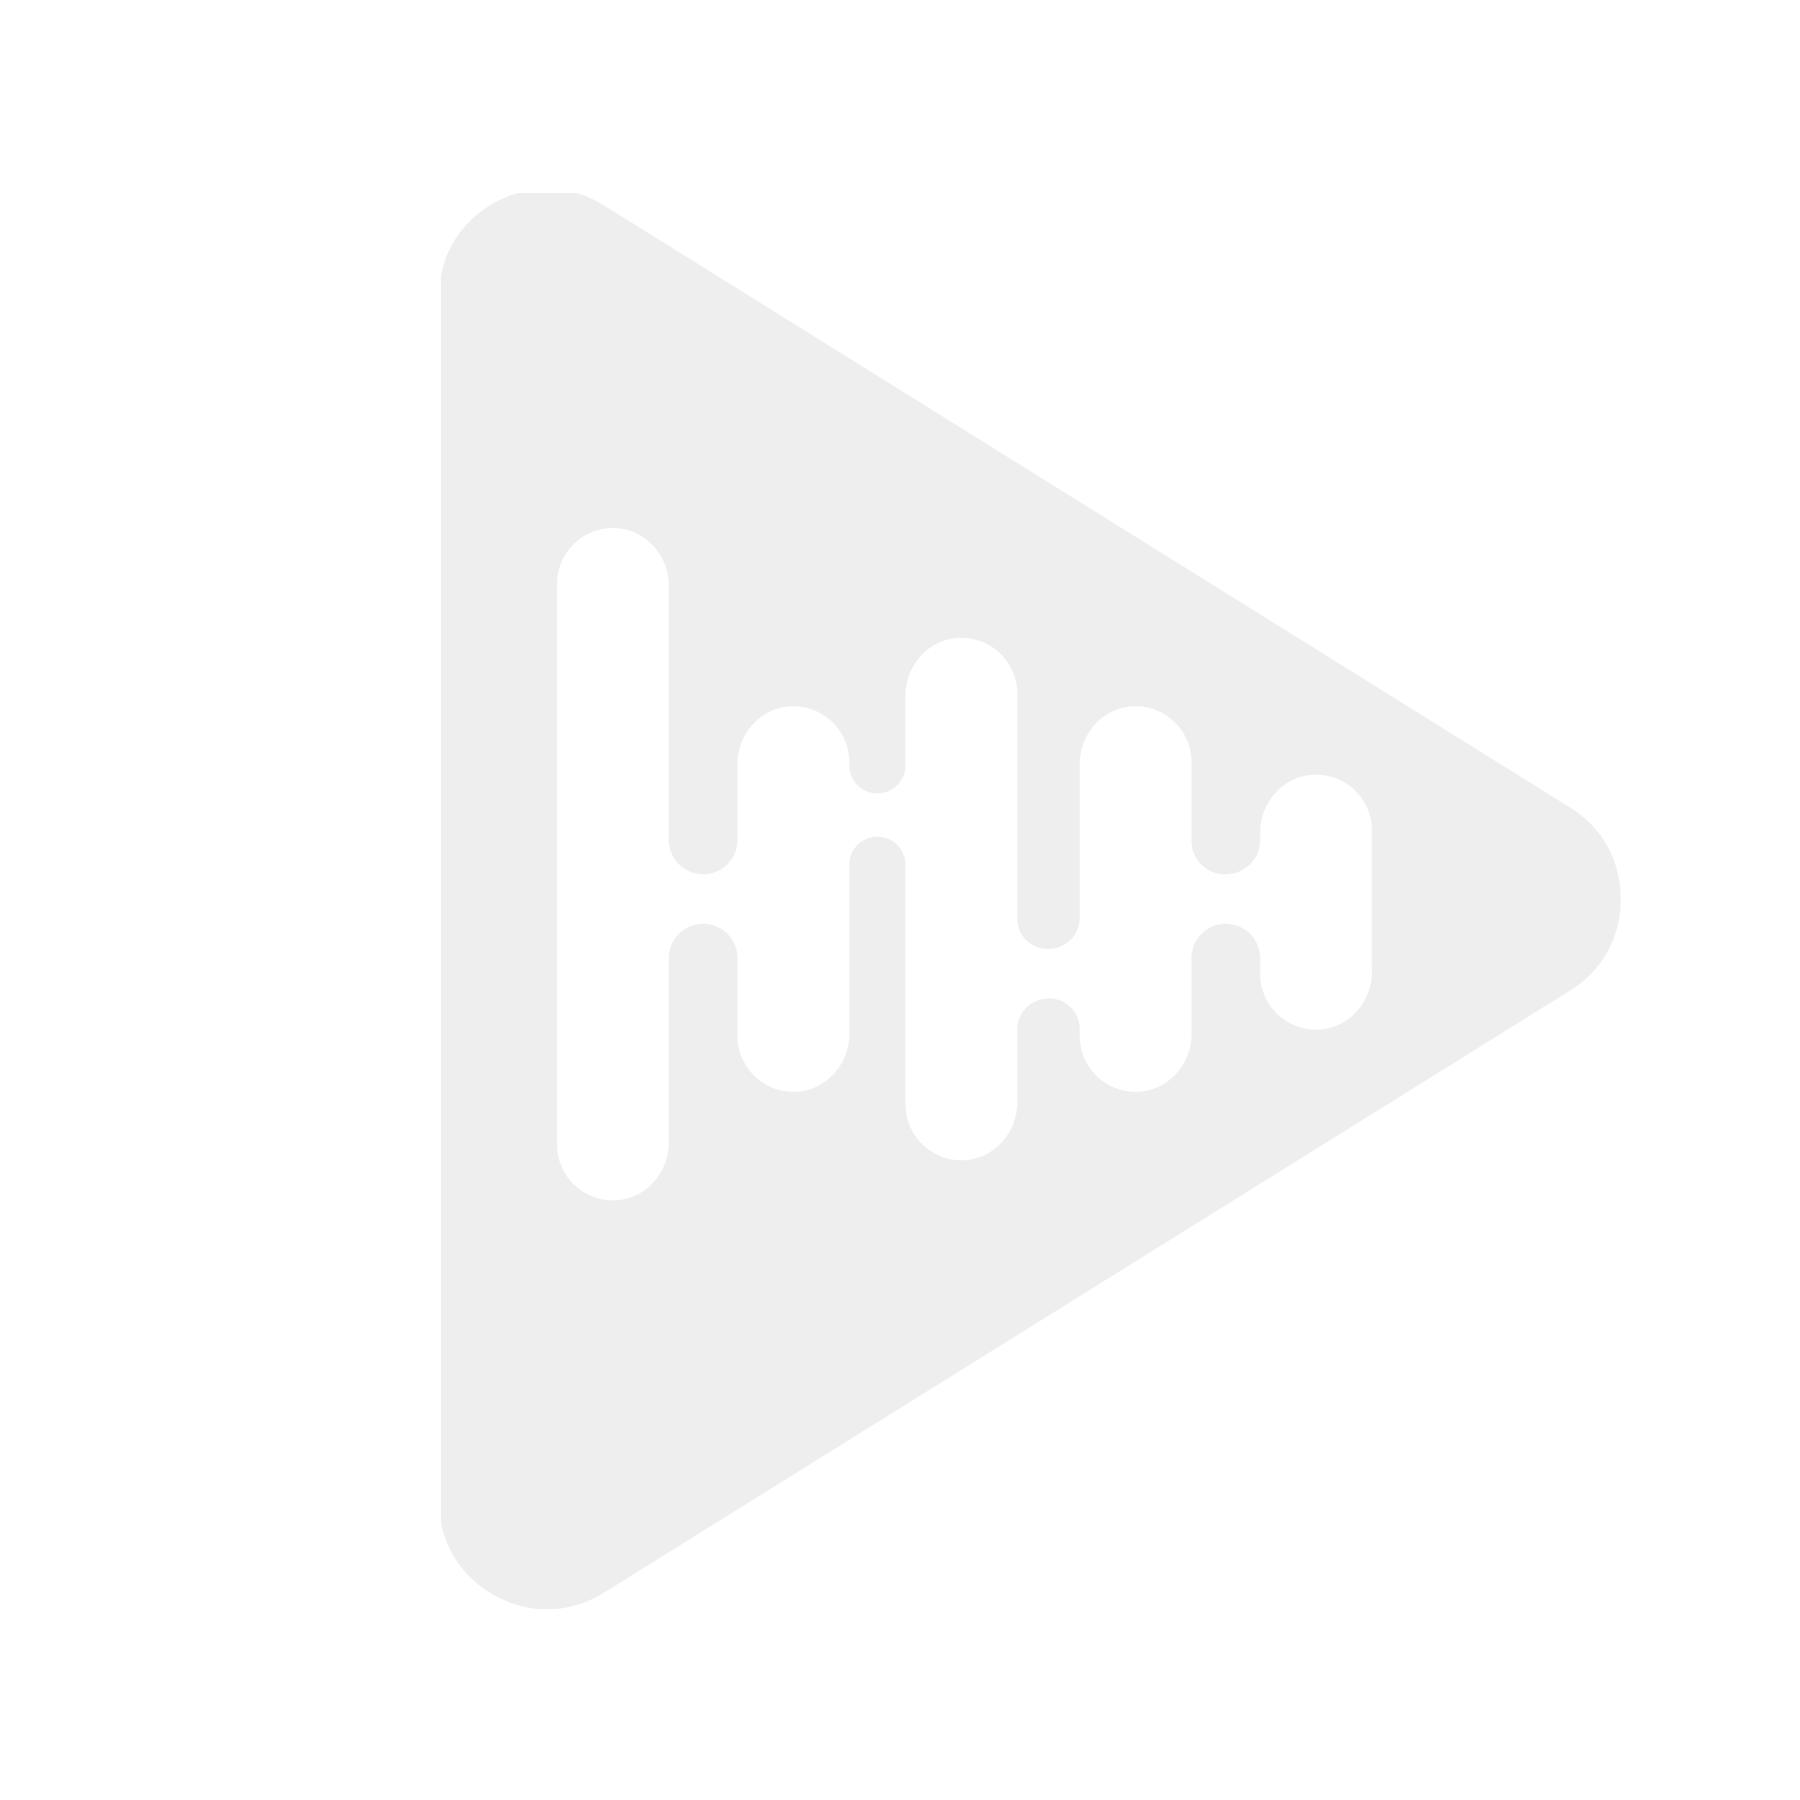 Audison AP F8.9 BIT-ISO